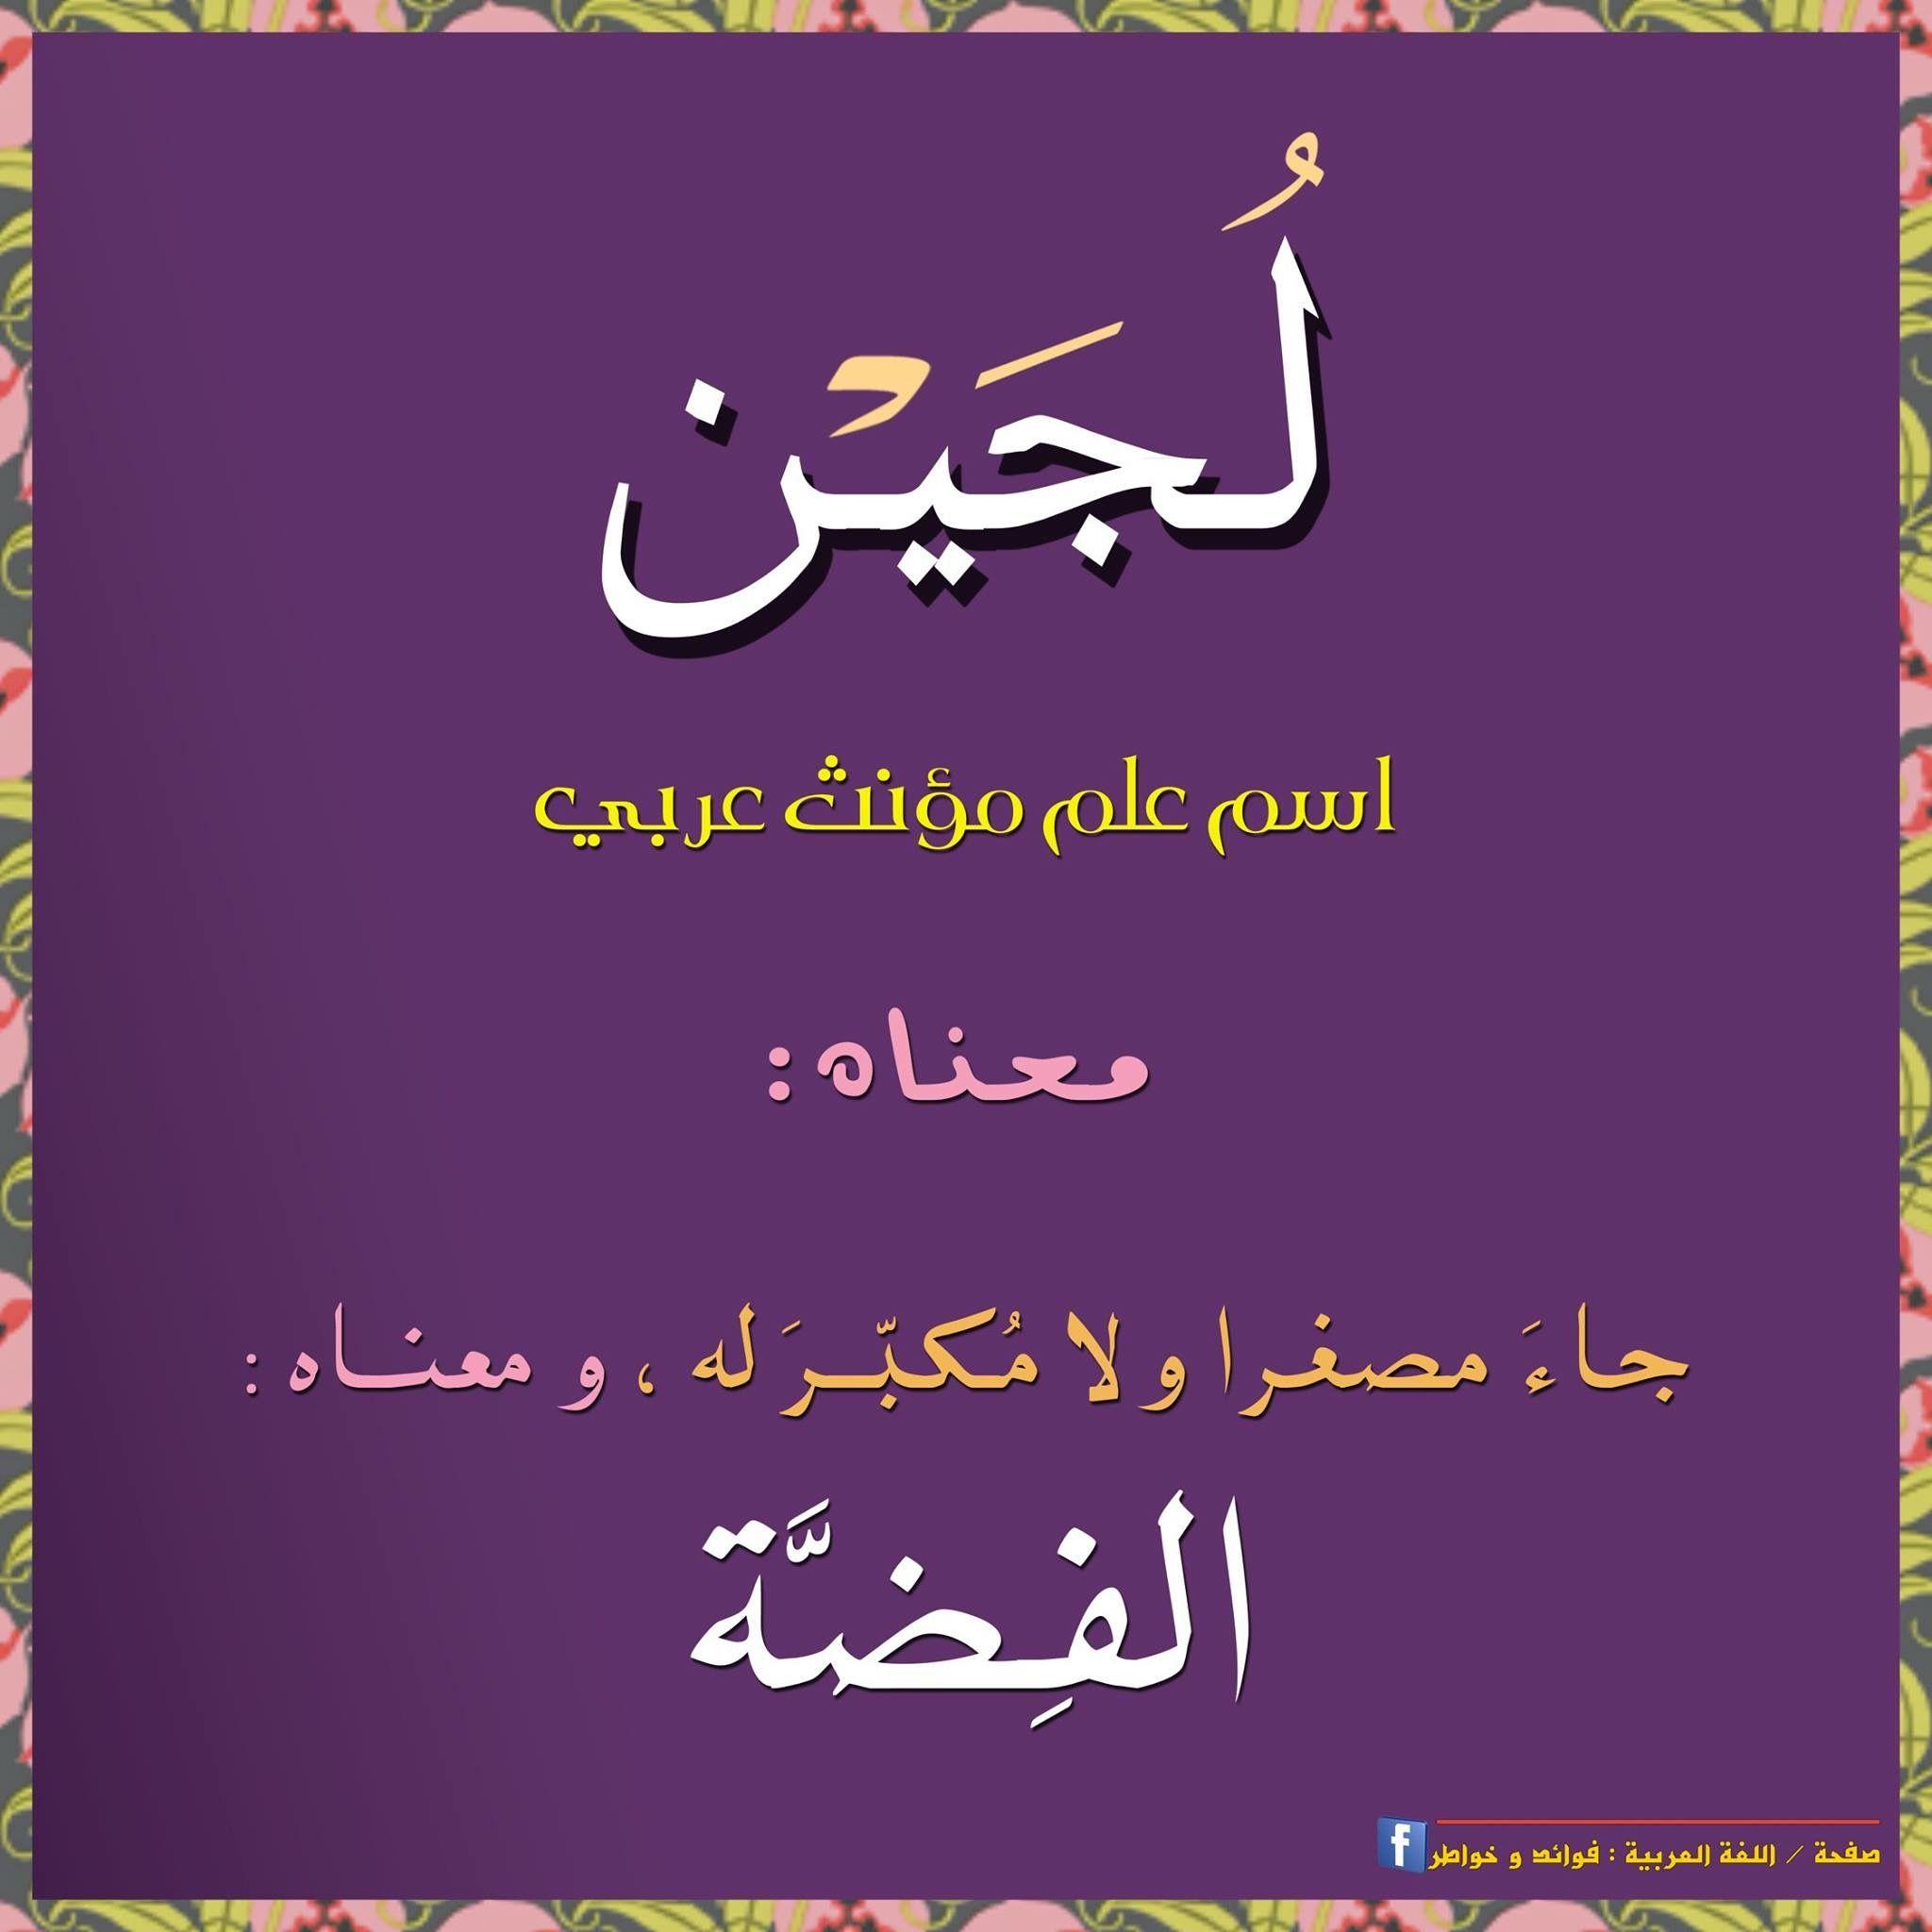 Pin By عطر الياسمين On Arabic Names Learn Arabic Language Arabic Words Learning Arabic